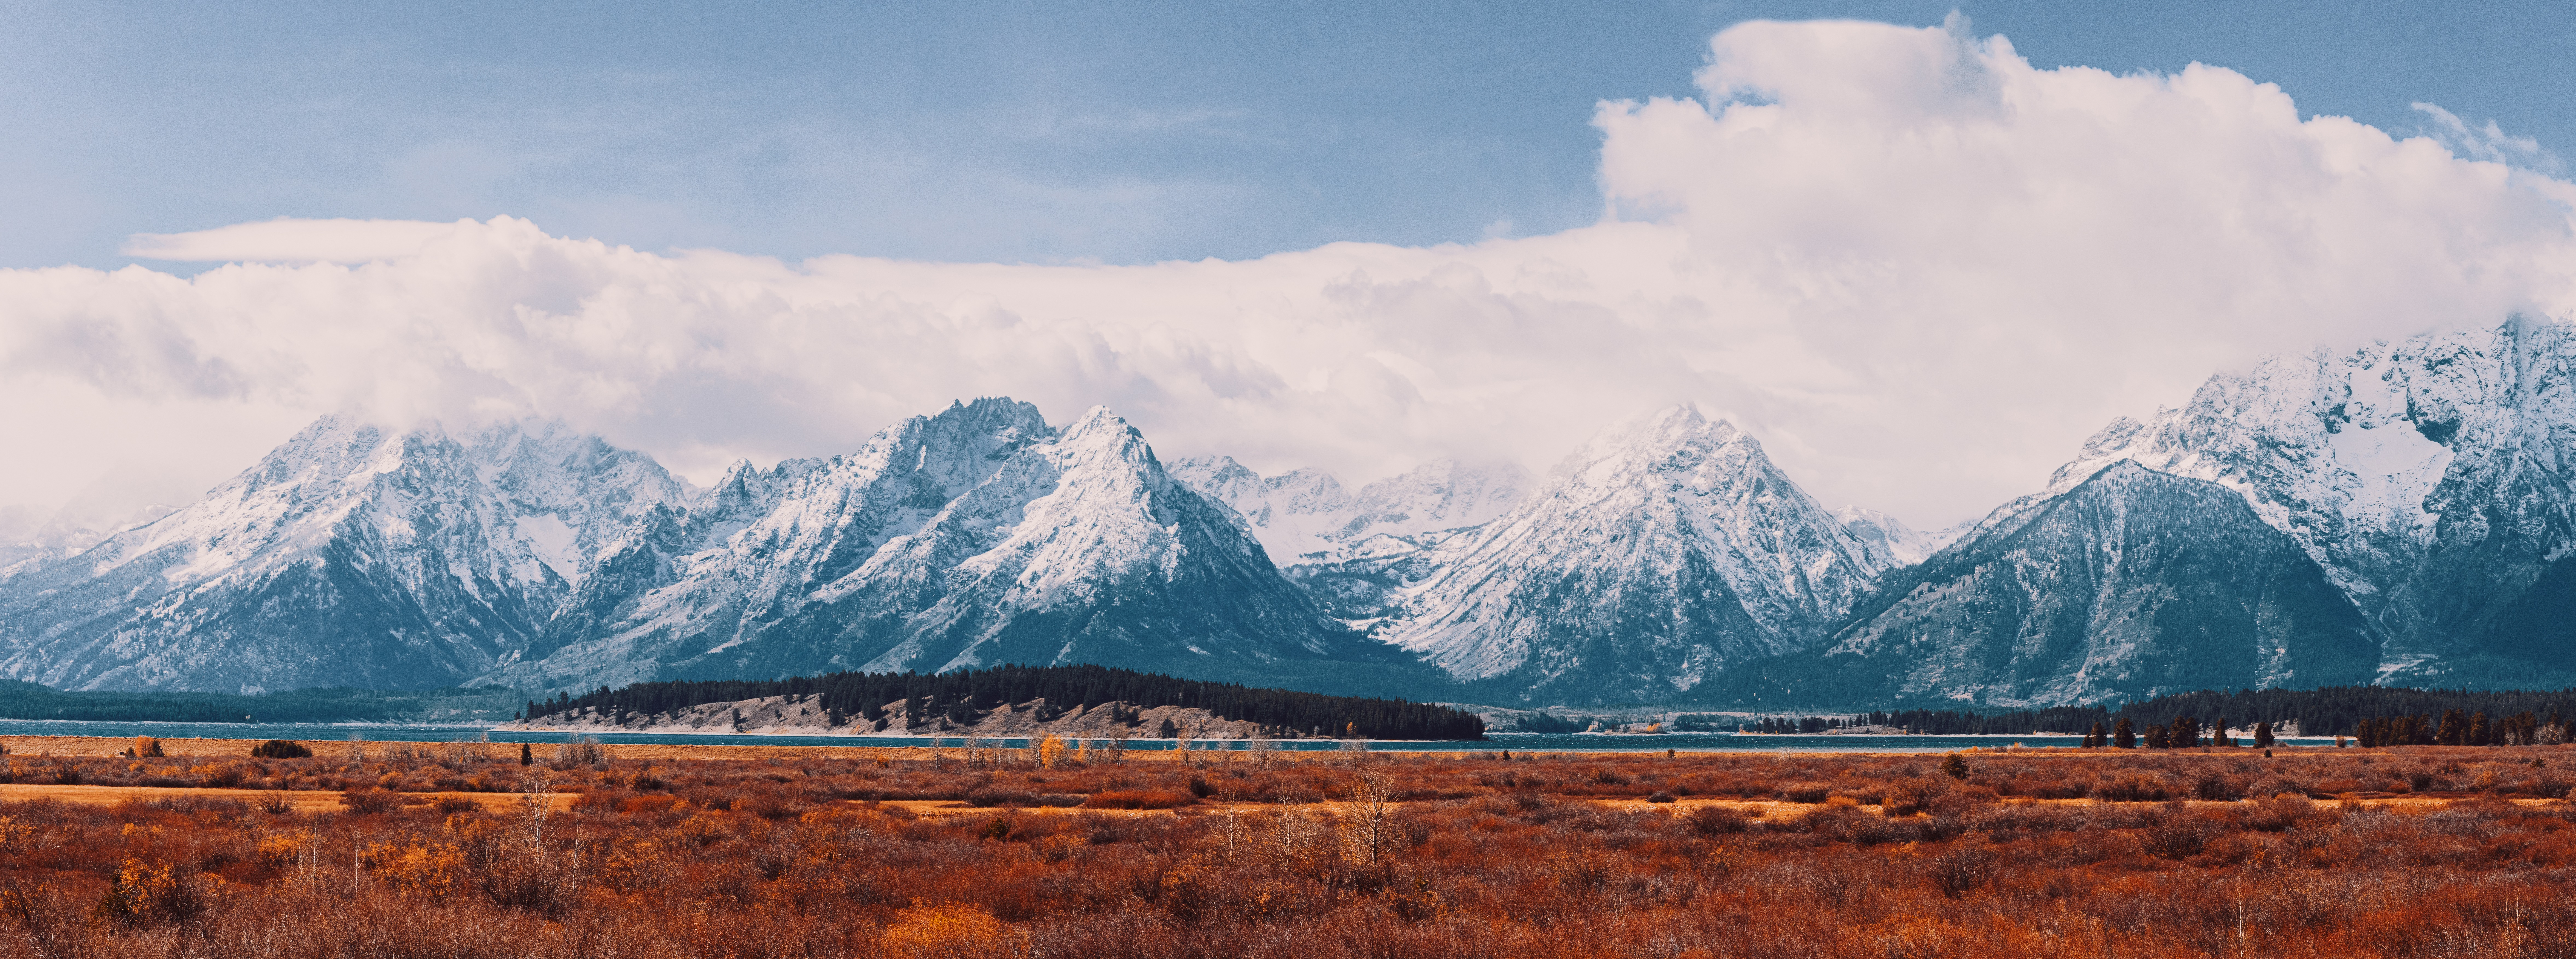 General 9418x3507 landscape Grand Teton National Park snow mountains lake Wyoming